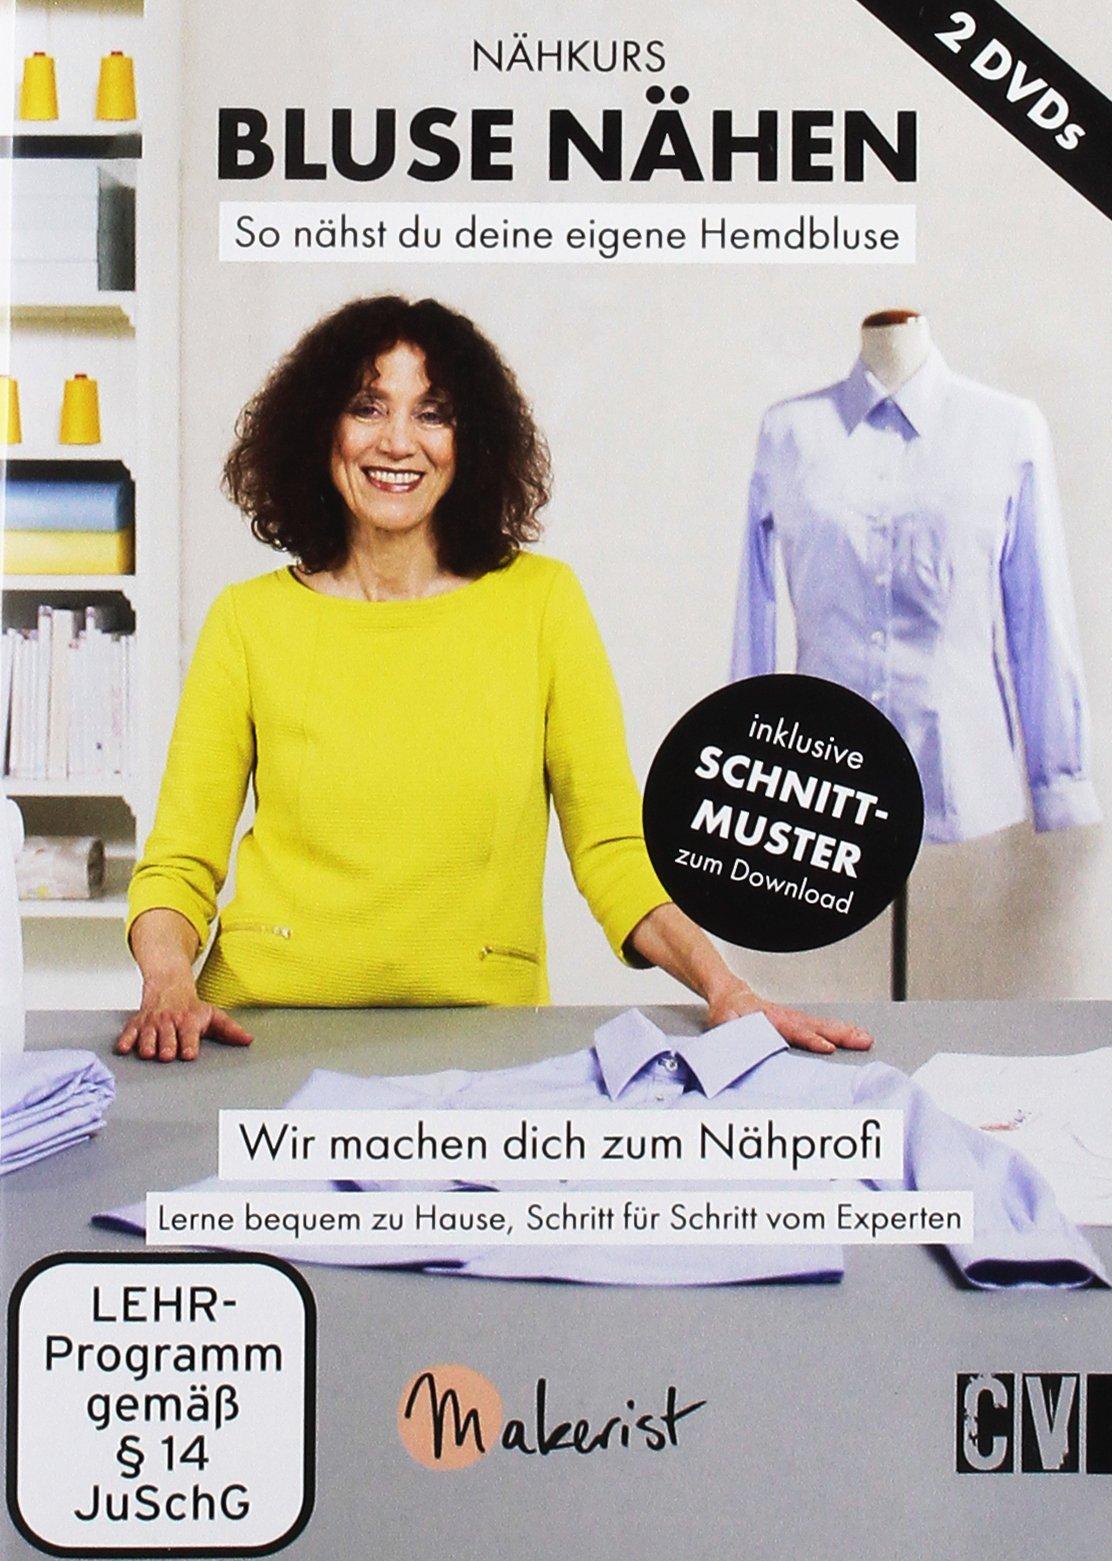 Makerist DVD Bluse nähen: Amazon.de: Bücher